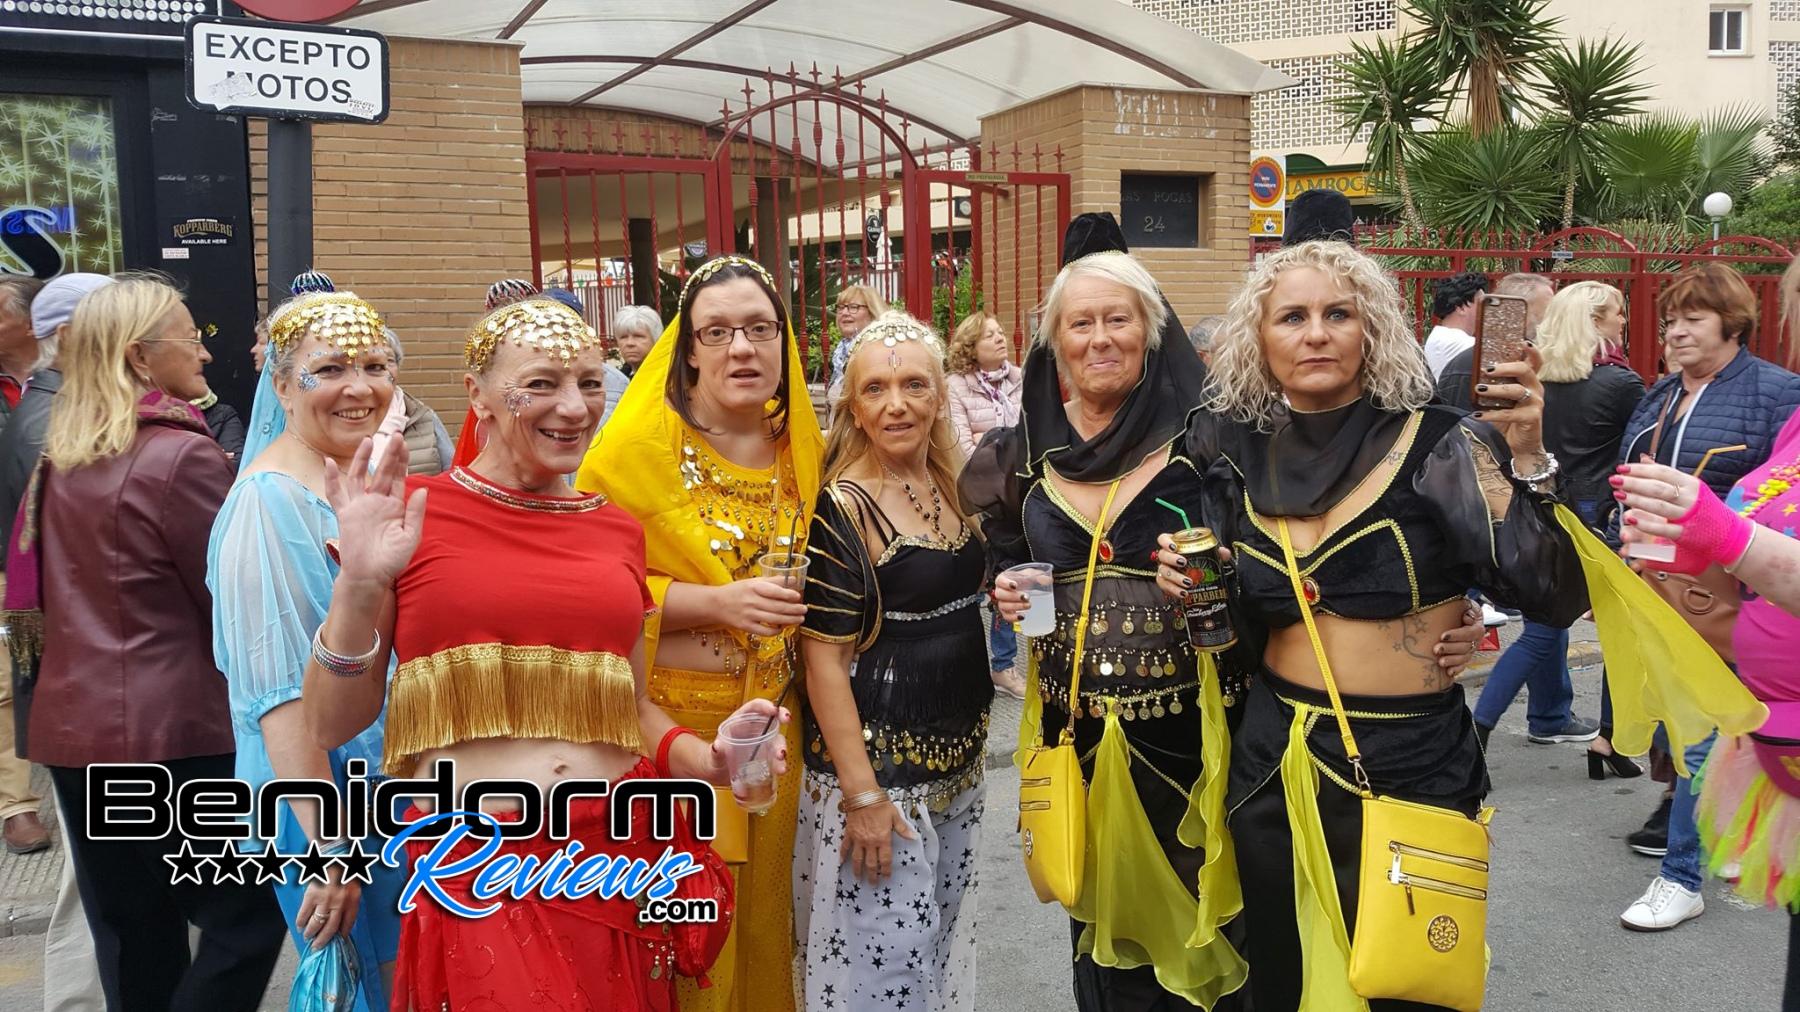 Benidorm-Fiestas-2019-Fancy-Dress-238